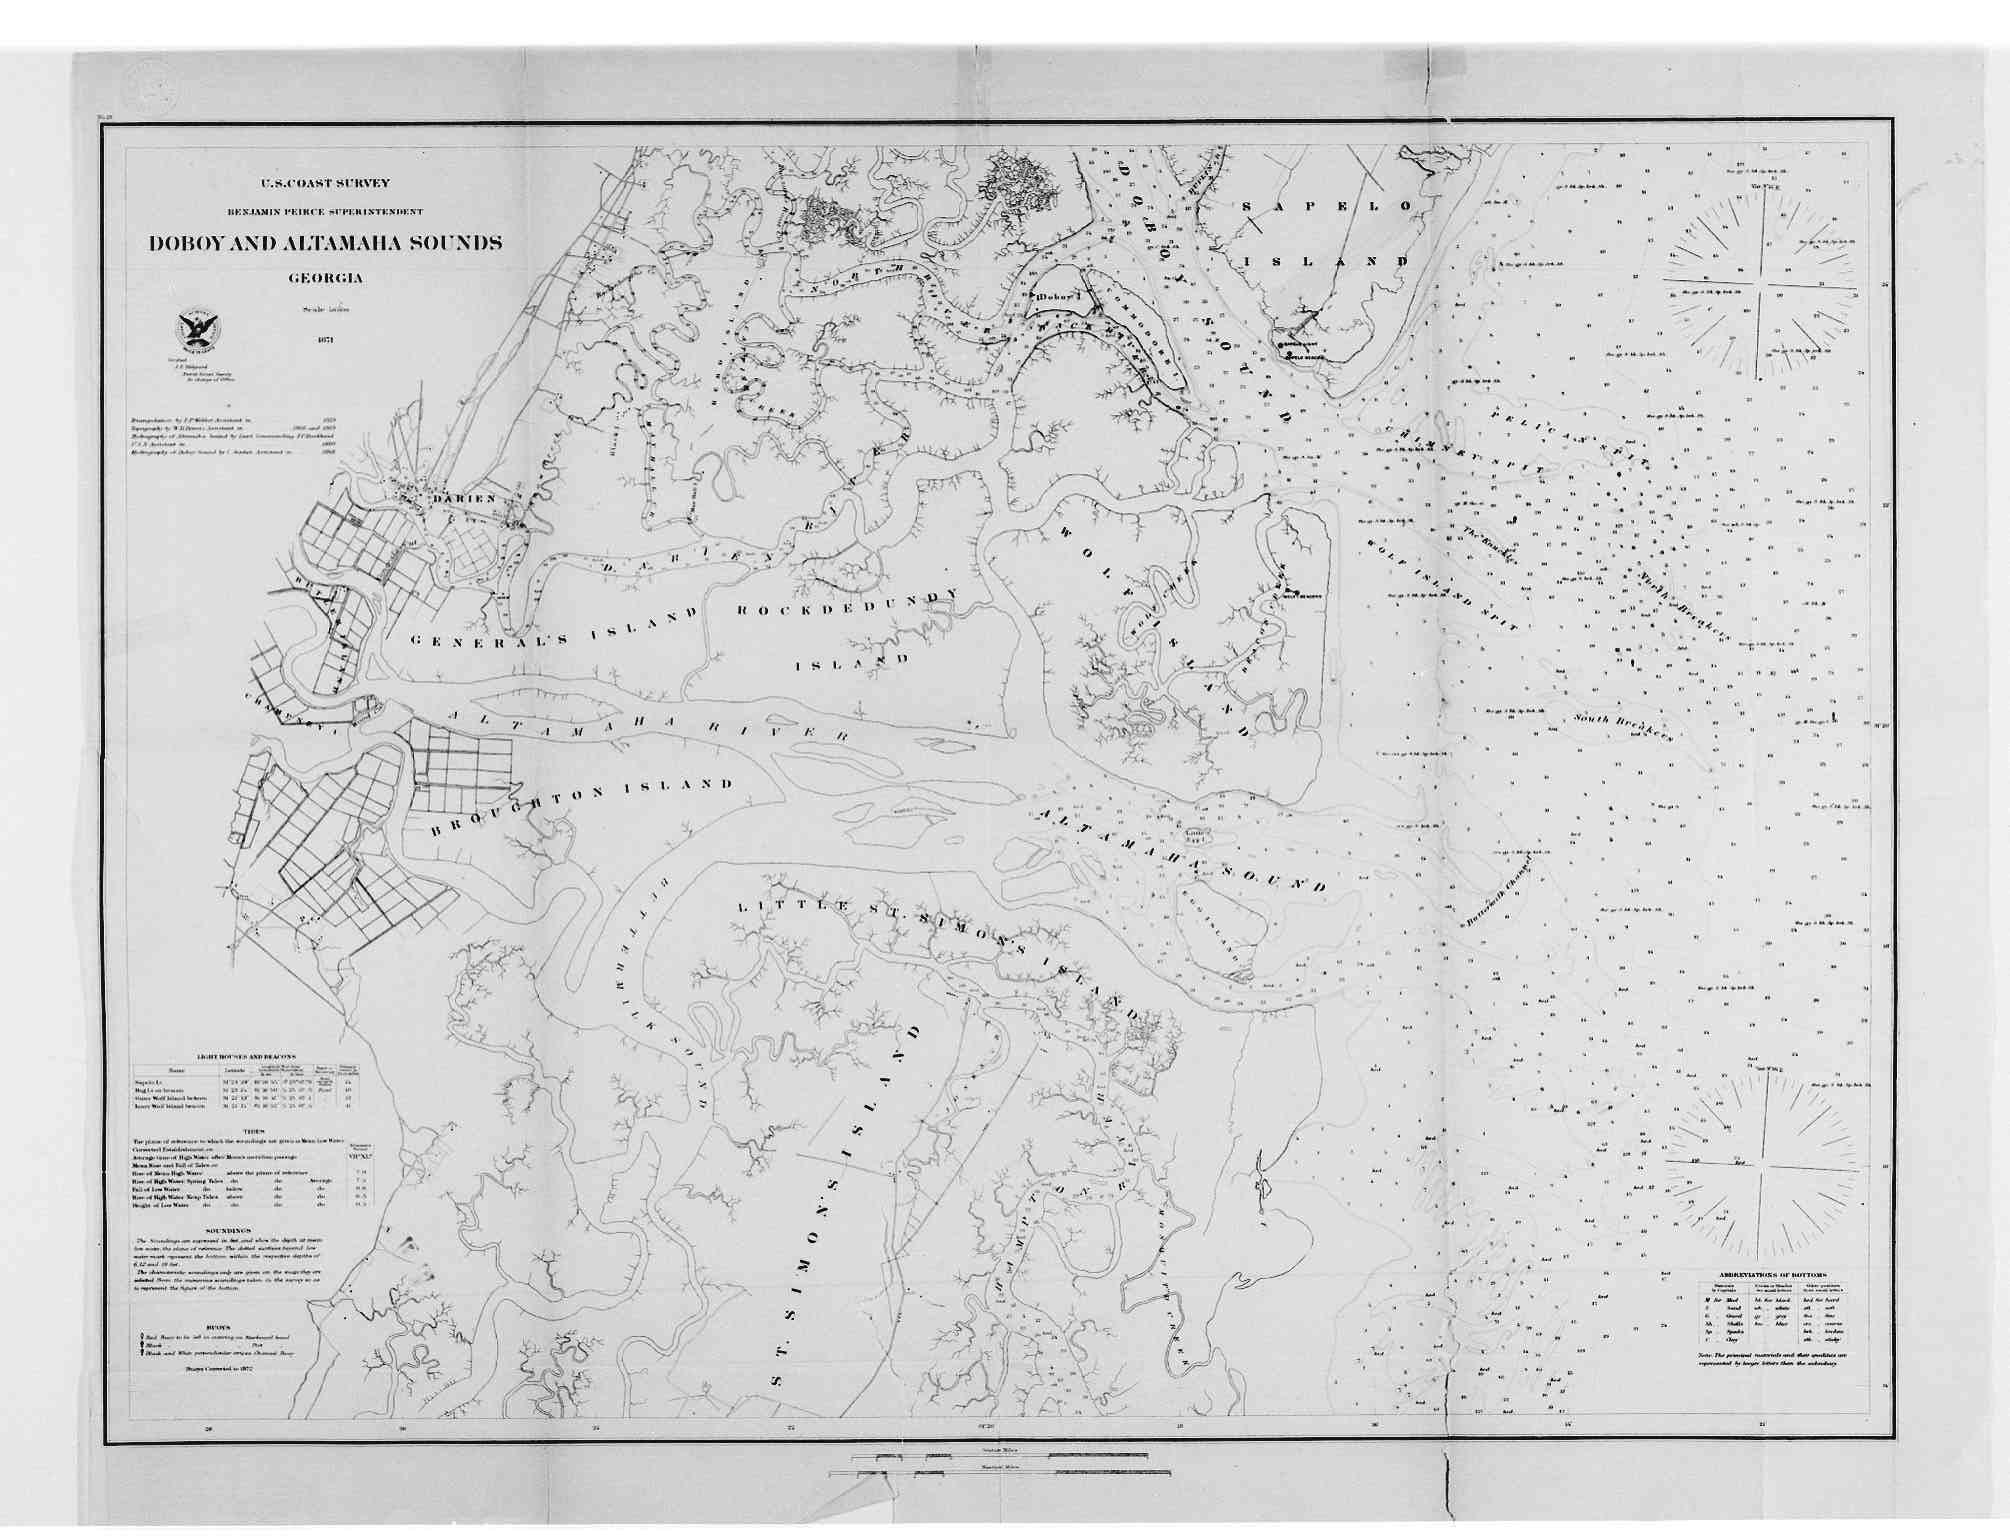 Hargrett Liry Rare Map Collection - Savannah & the Coast on jekyll island state park map, arctic map, georgia piedmont map, georgia glacial map, plains georgia map, georgia maritime map, georgia fishing map, georgia beaches map, georgia country map, georgia city map, georgia colonial map, georgia africa map, georgia river map, georgia metro map, southeastern tennessee map, georgia savannah map, georgia water map, georgia europe map, georgia south map, georgia town map,